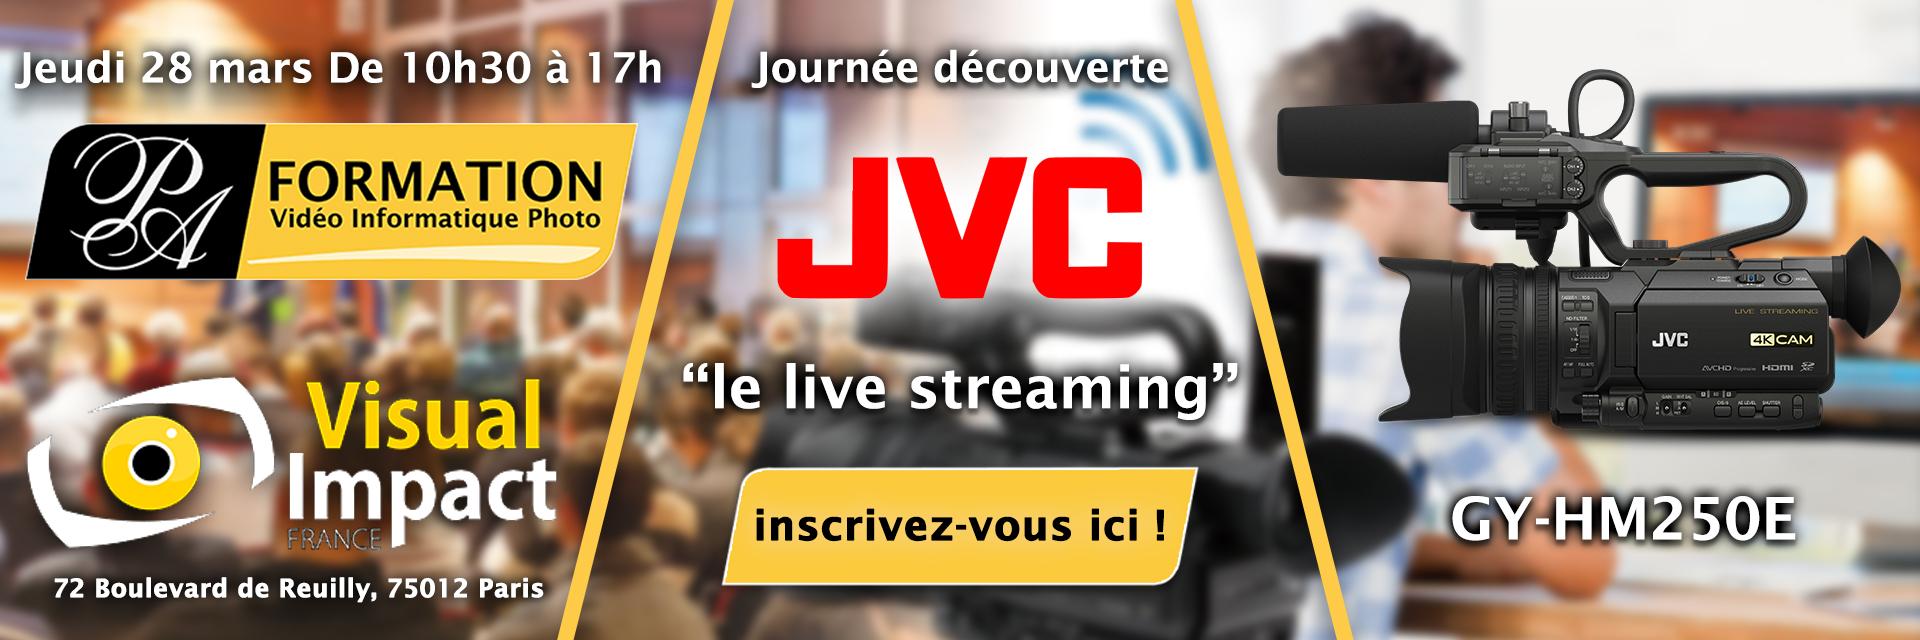 Journée découverte-JVC-live streaming-PA-FORMATION